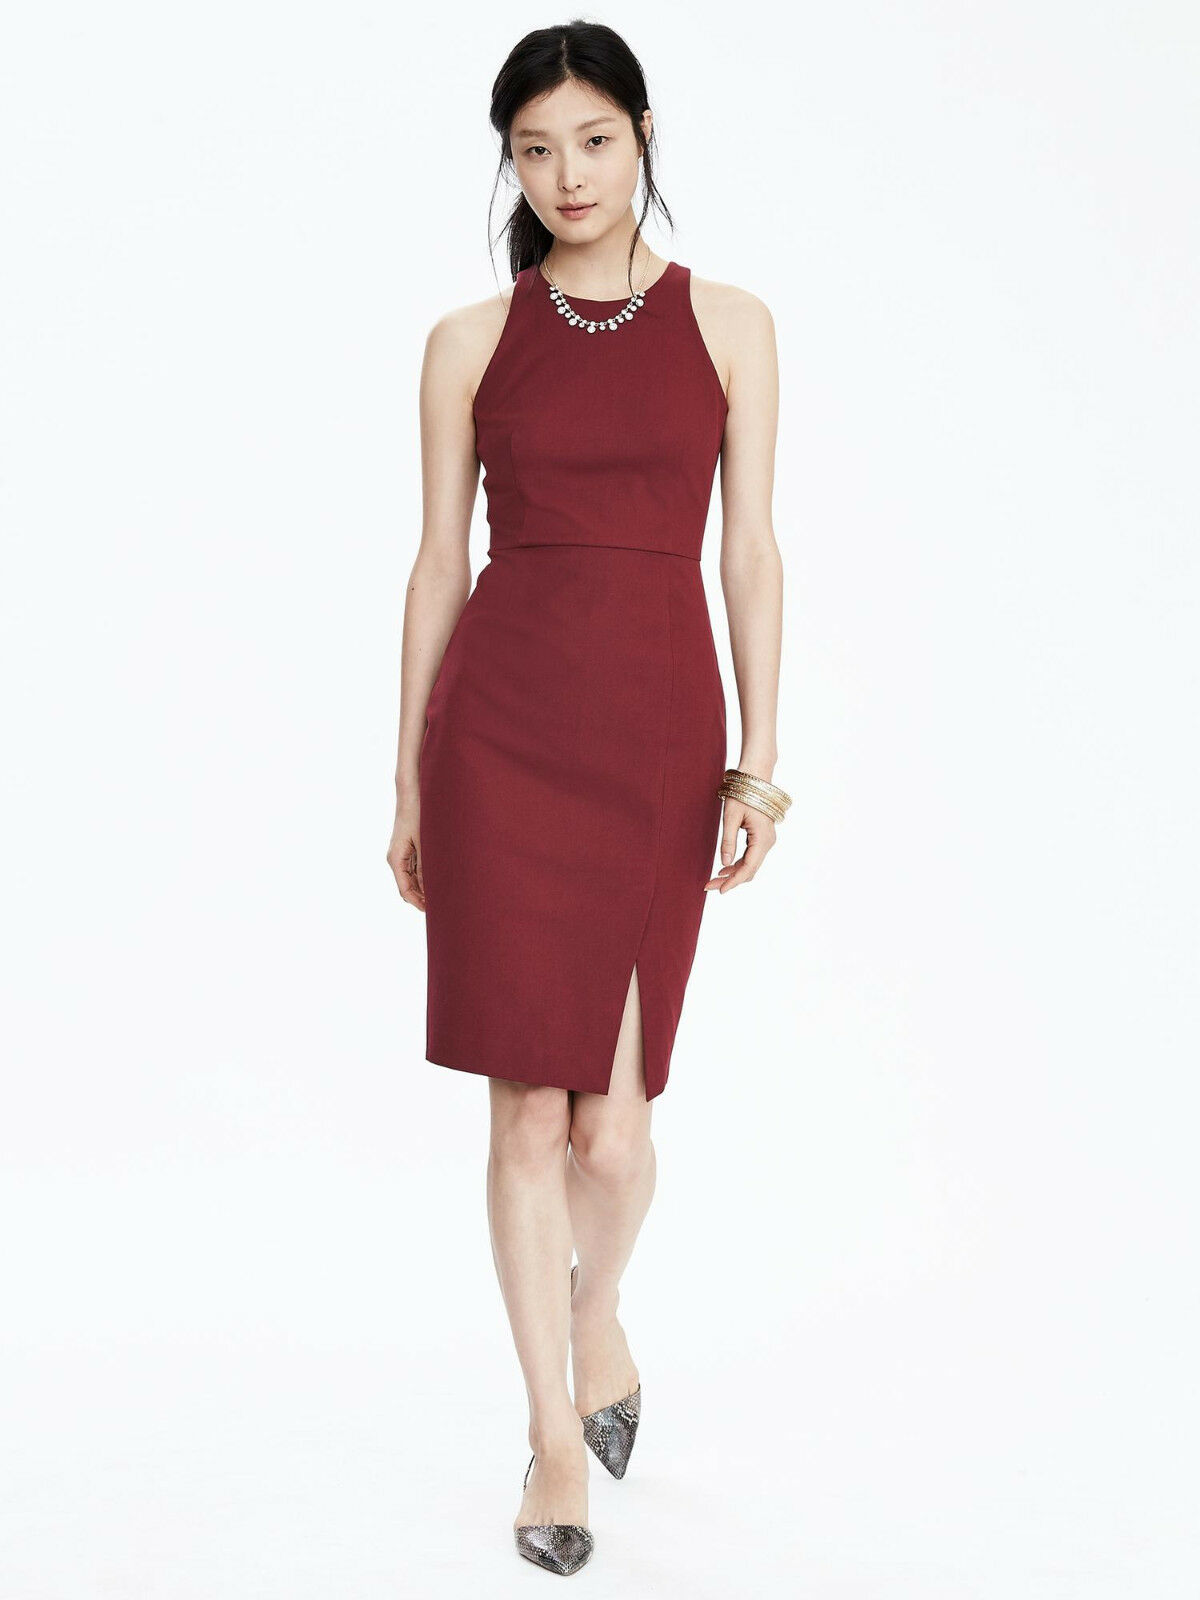 NWT Banana Republic Sleeveless Sheath Dress, Wine Größe 14P 14 P